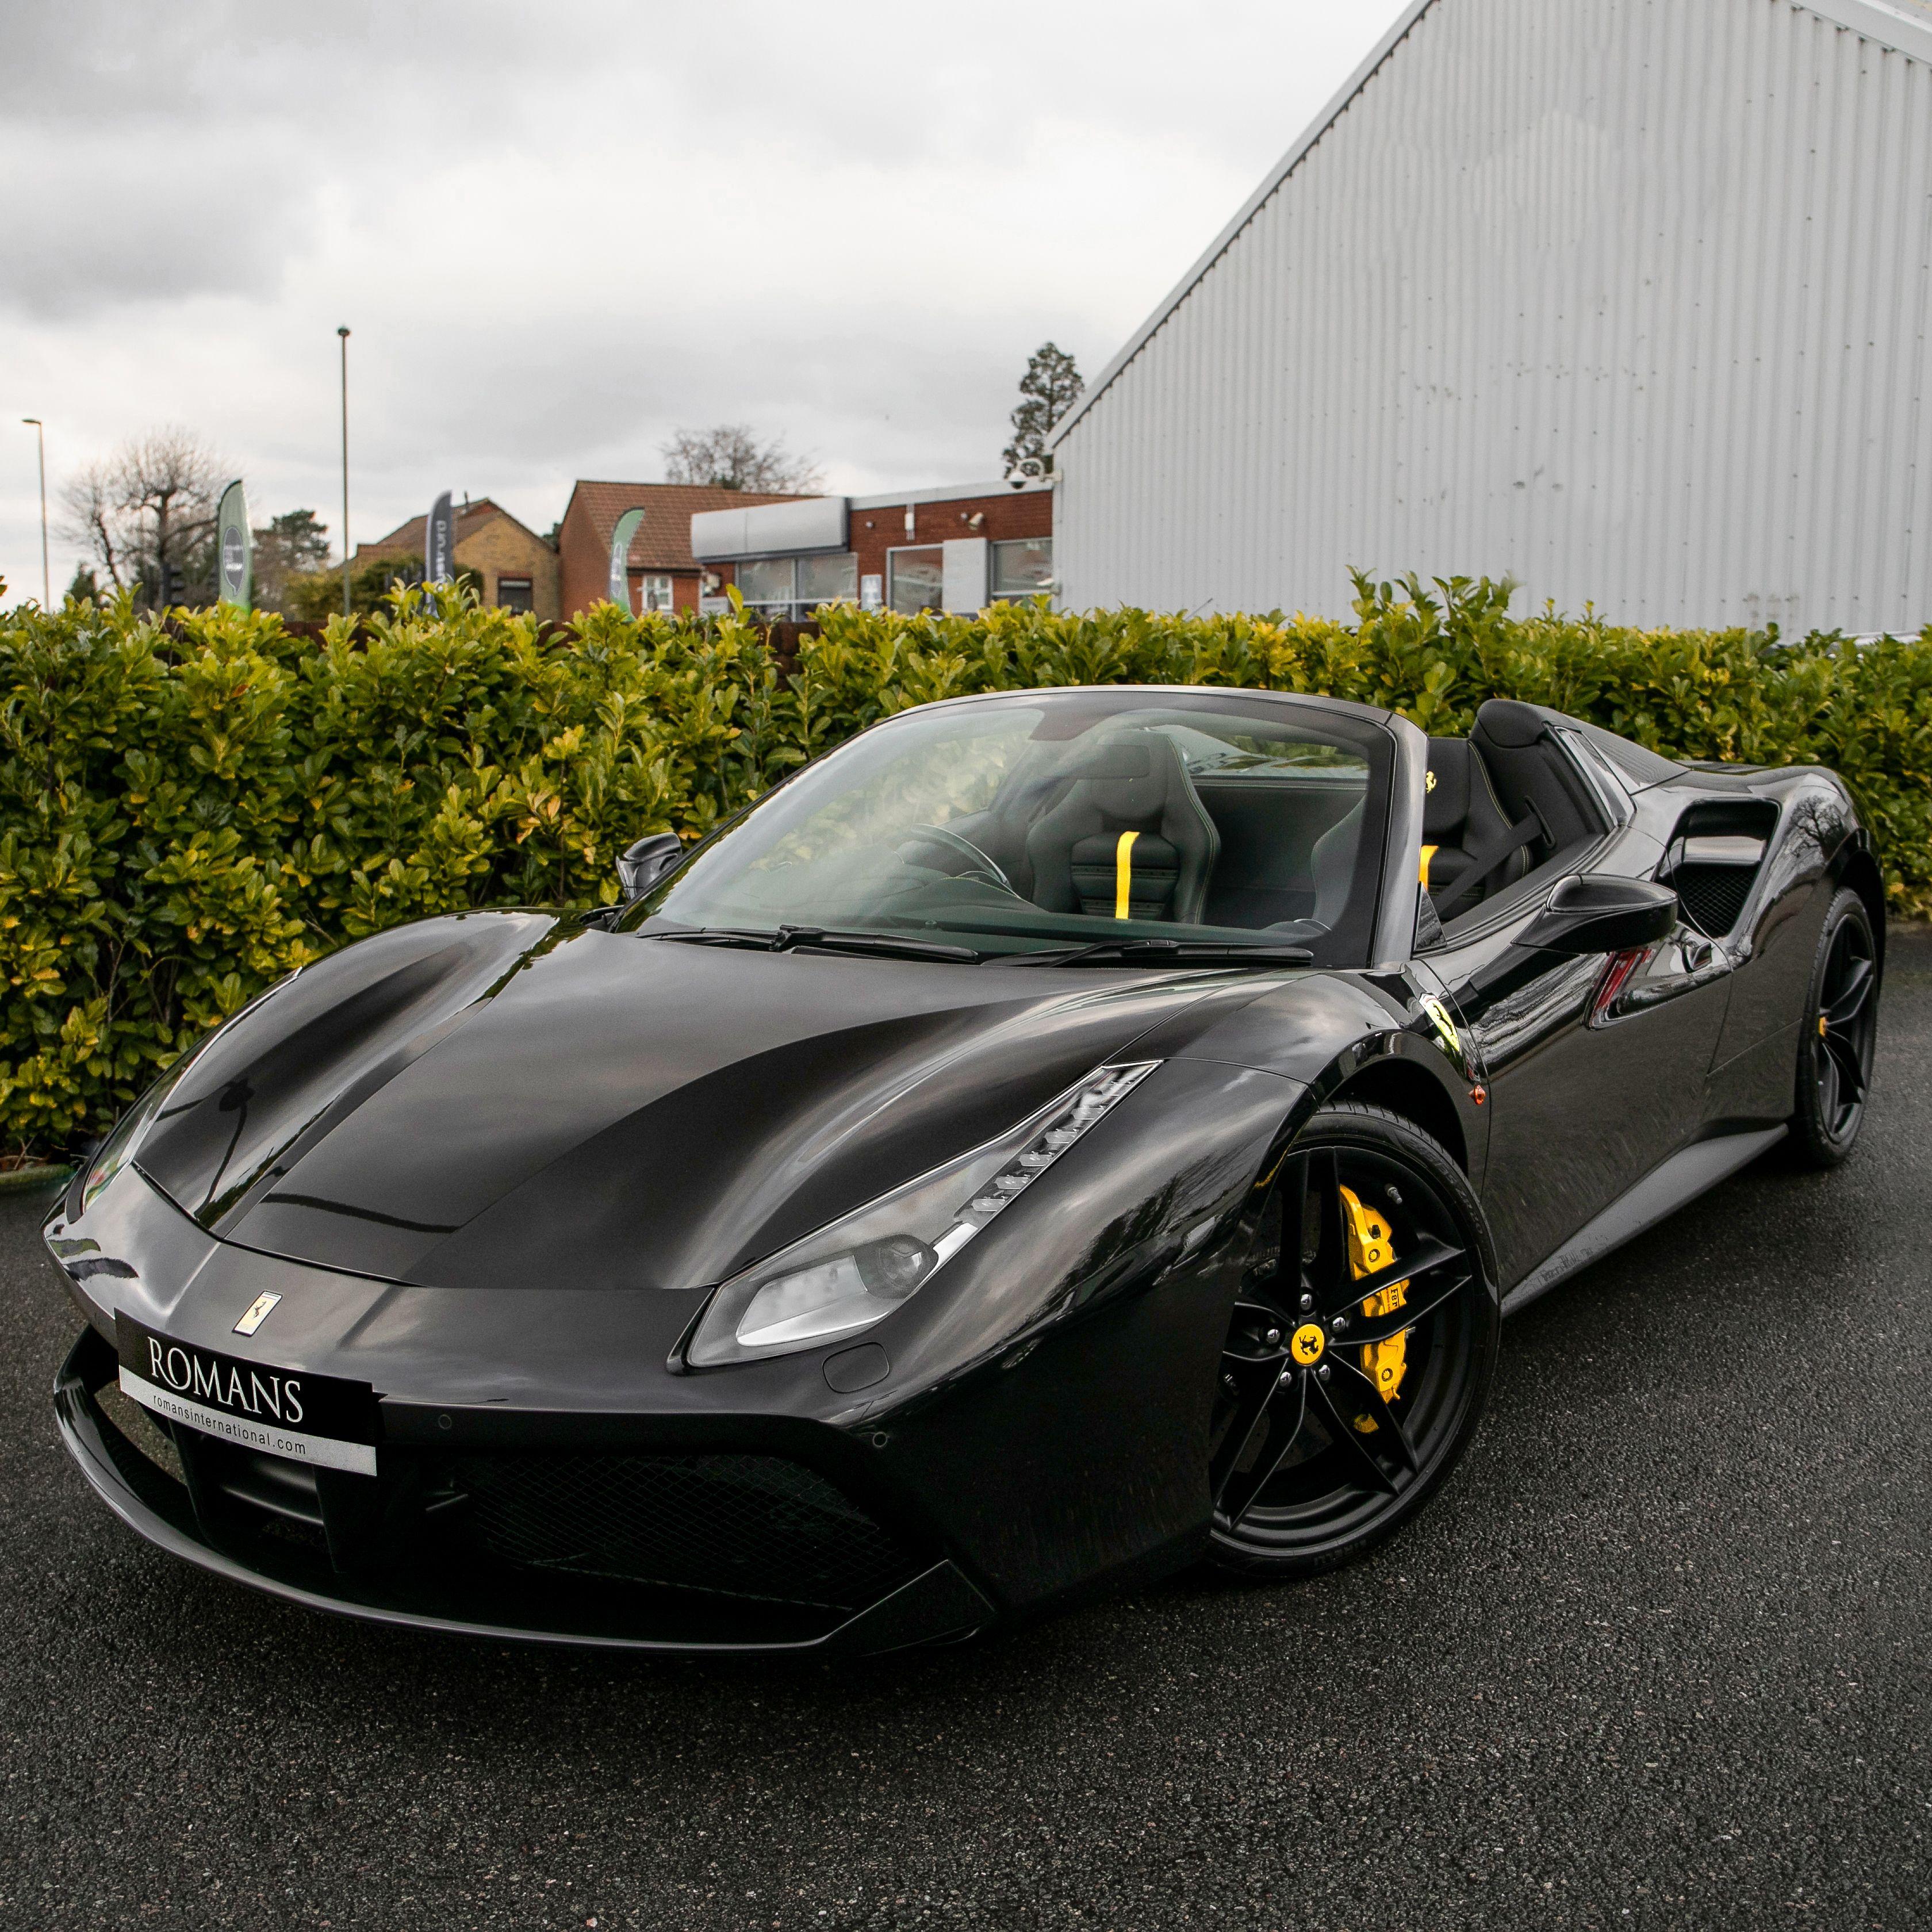 Ferrari Supercar: The Black Stallion Has Arrived! #Ferrari #488Spider